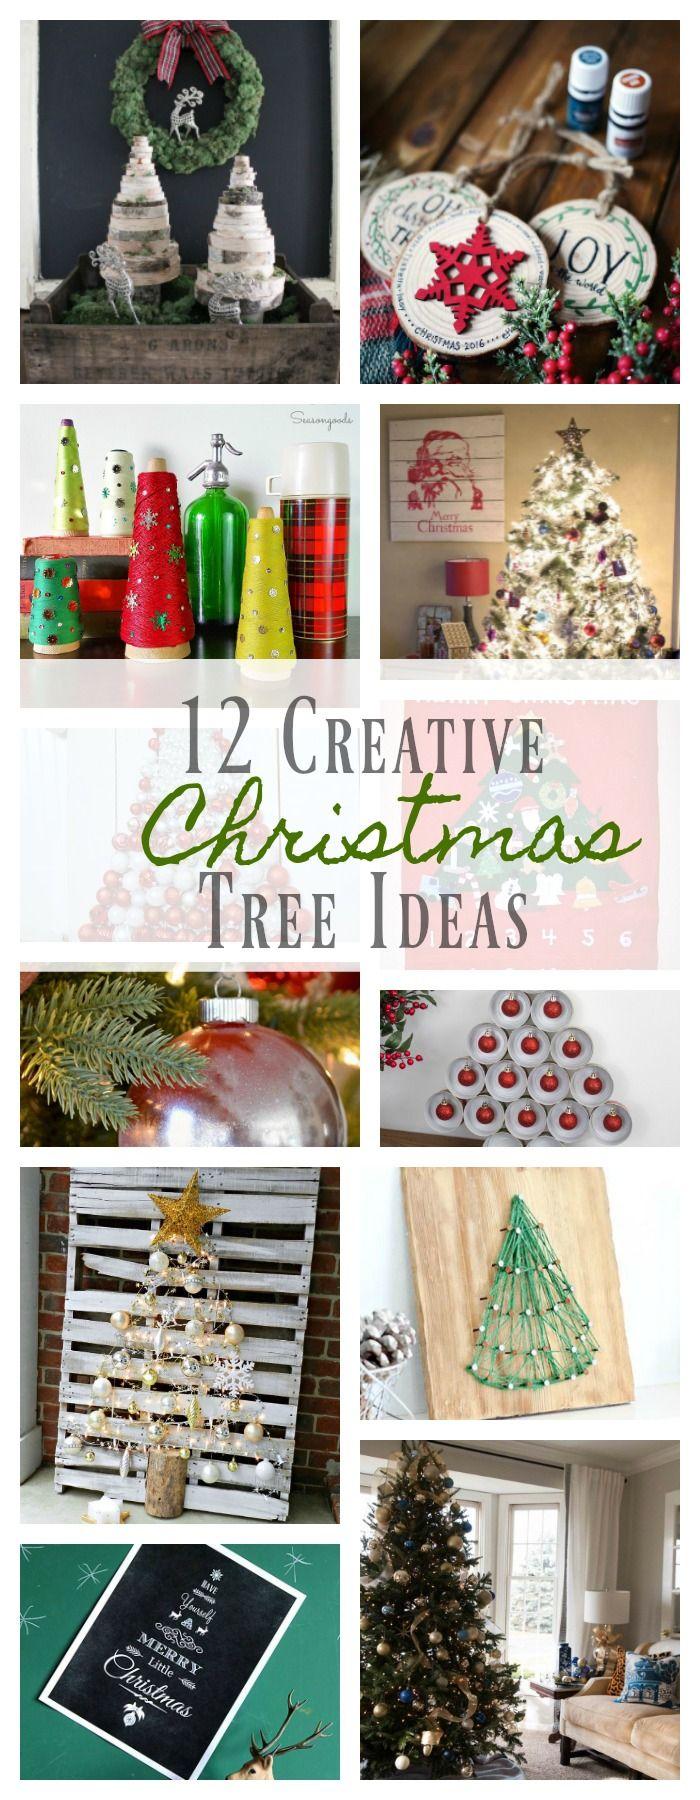 12 Creative Christmas Tree Ideas